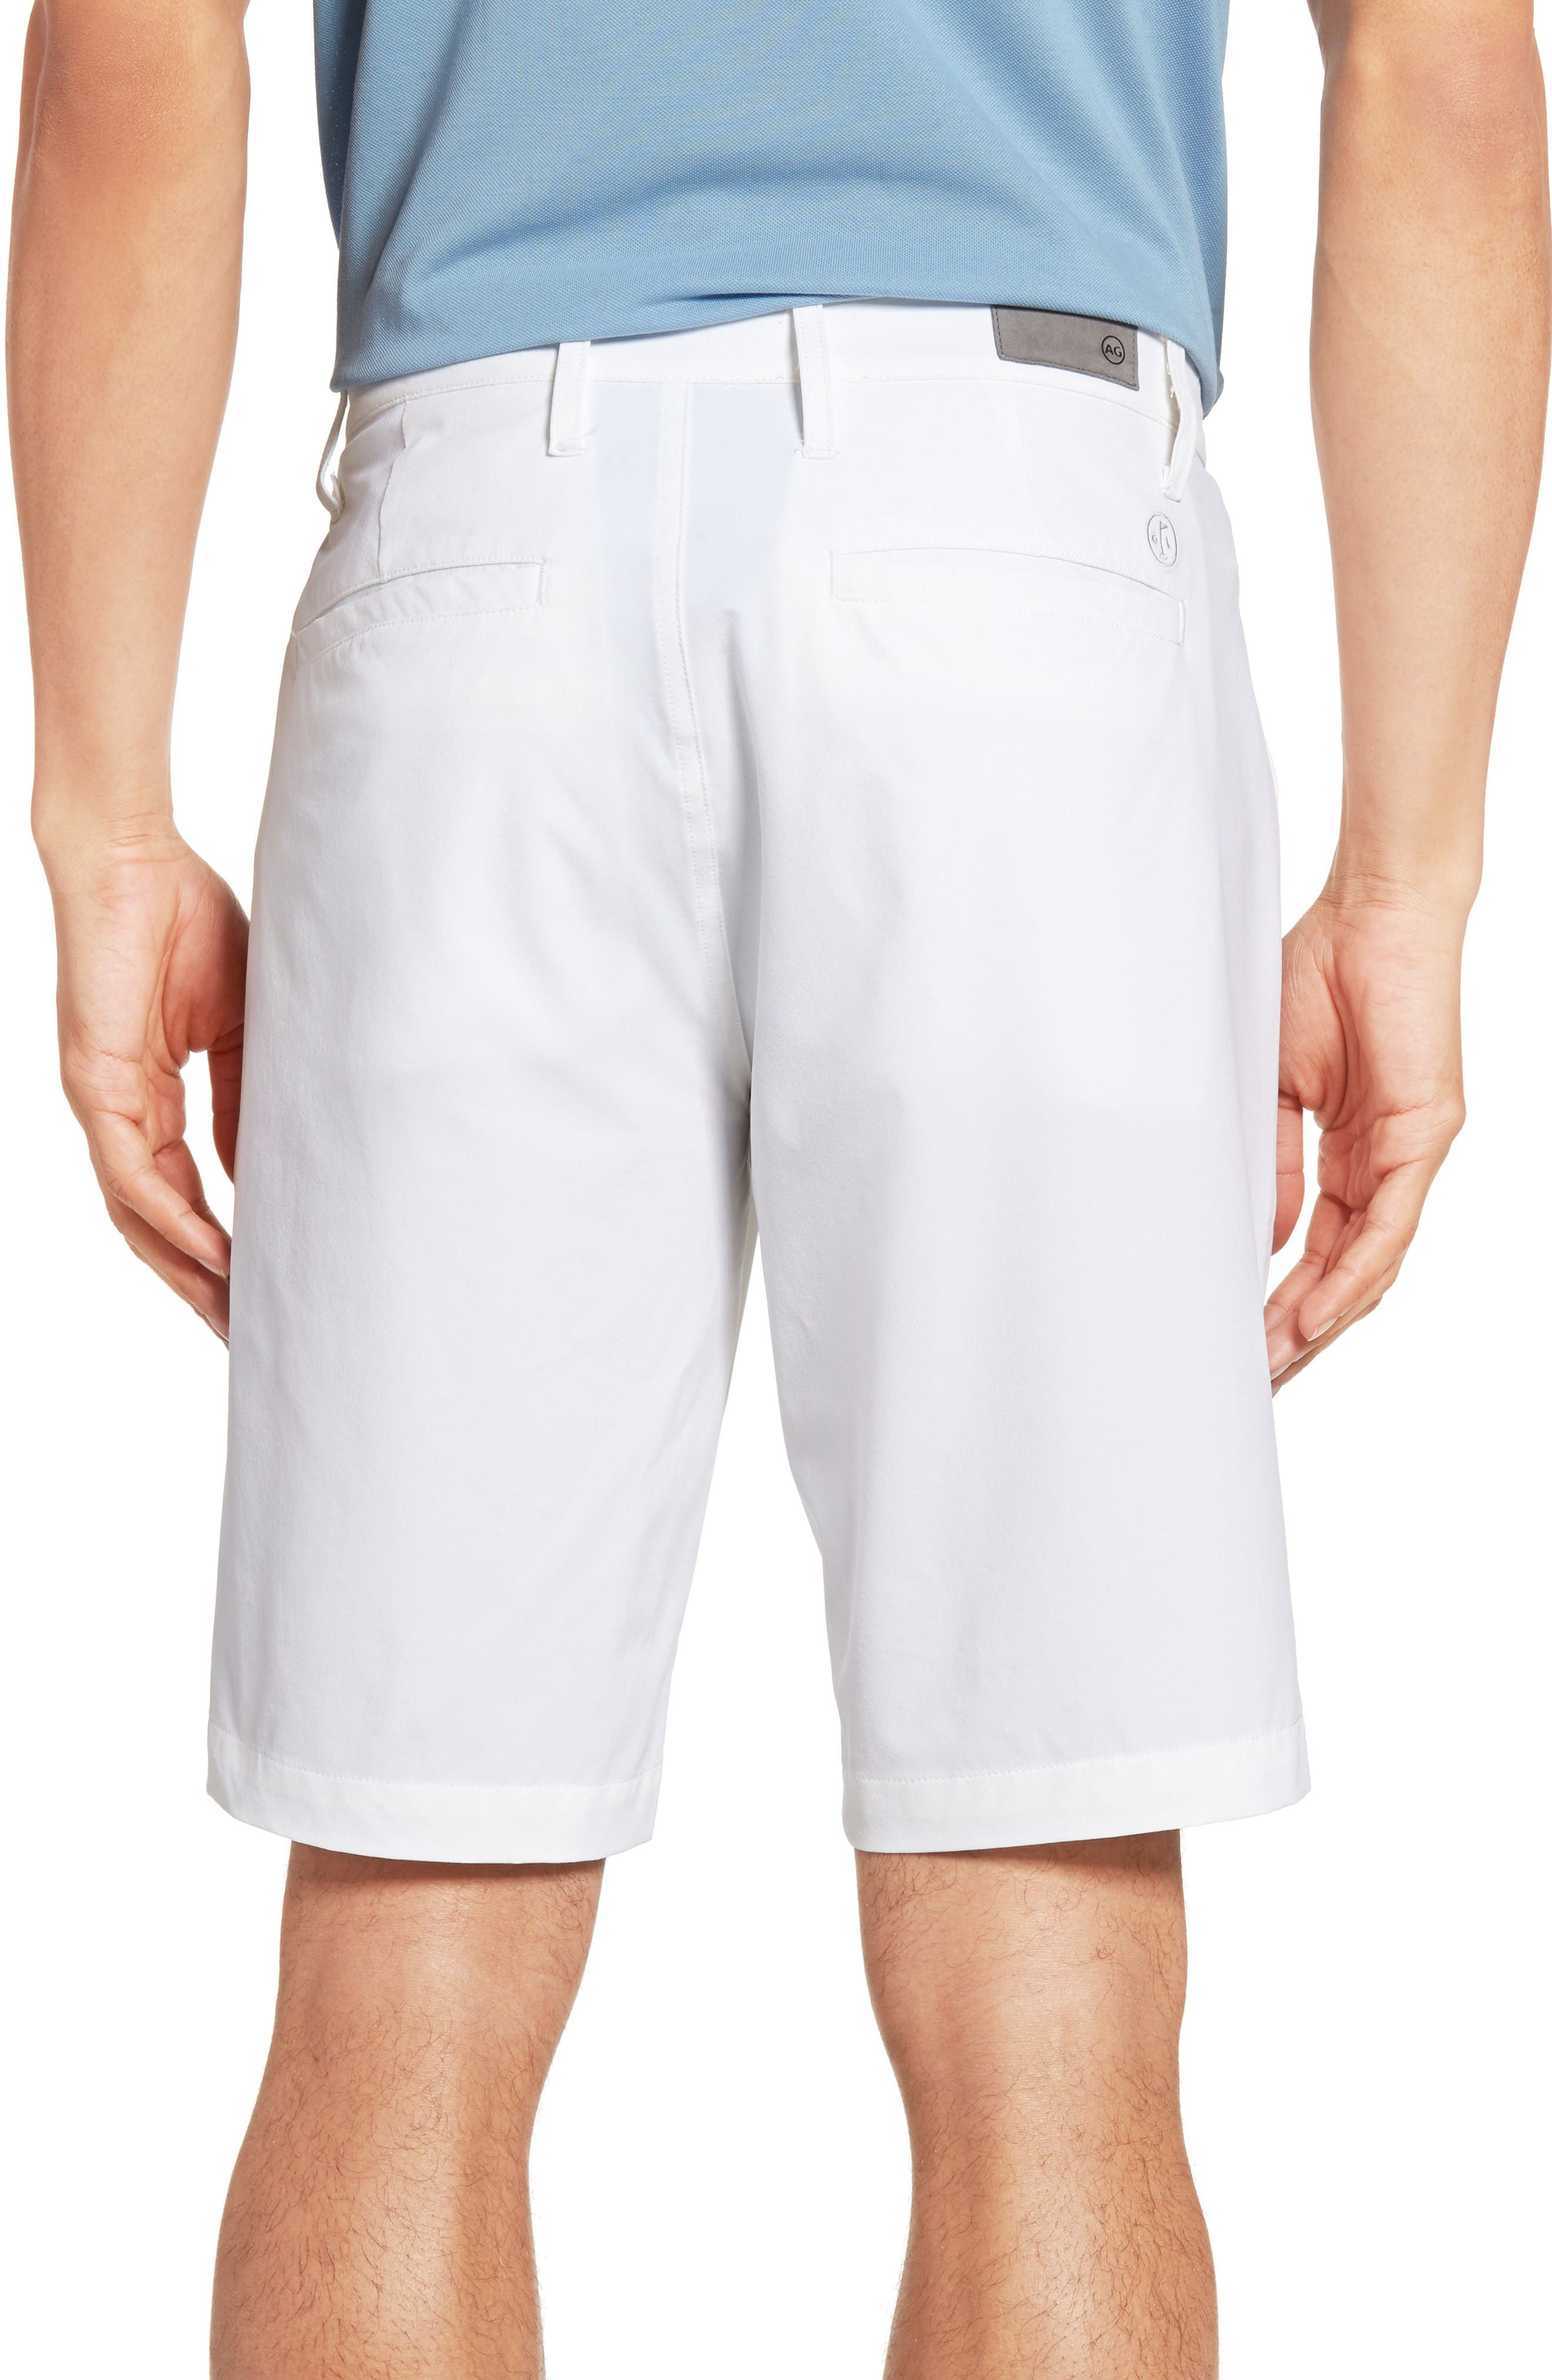 Canyon Shorts,                             Alternate thumbnail 2, color,                             Bright White